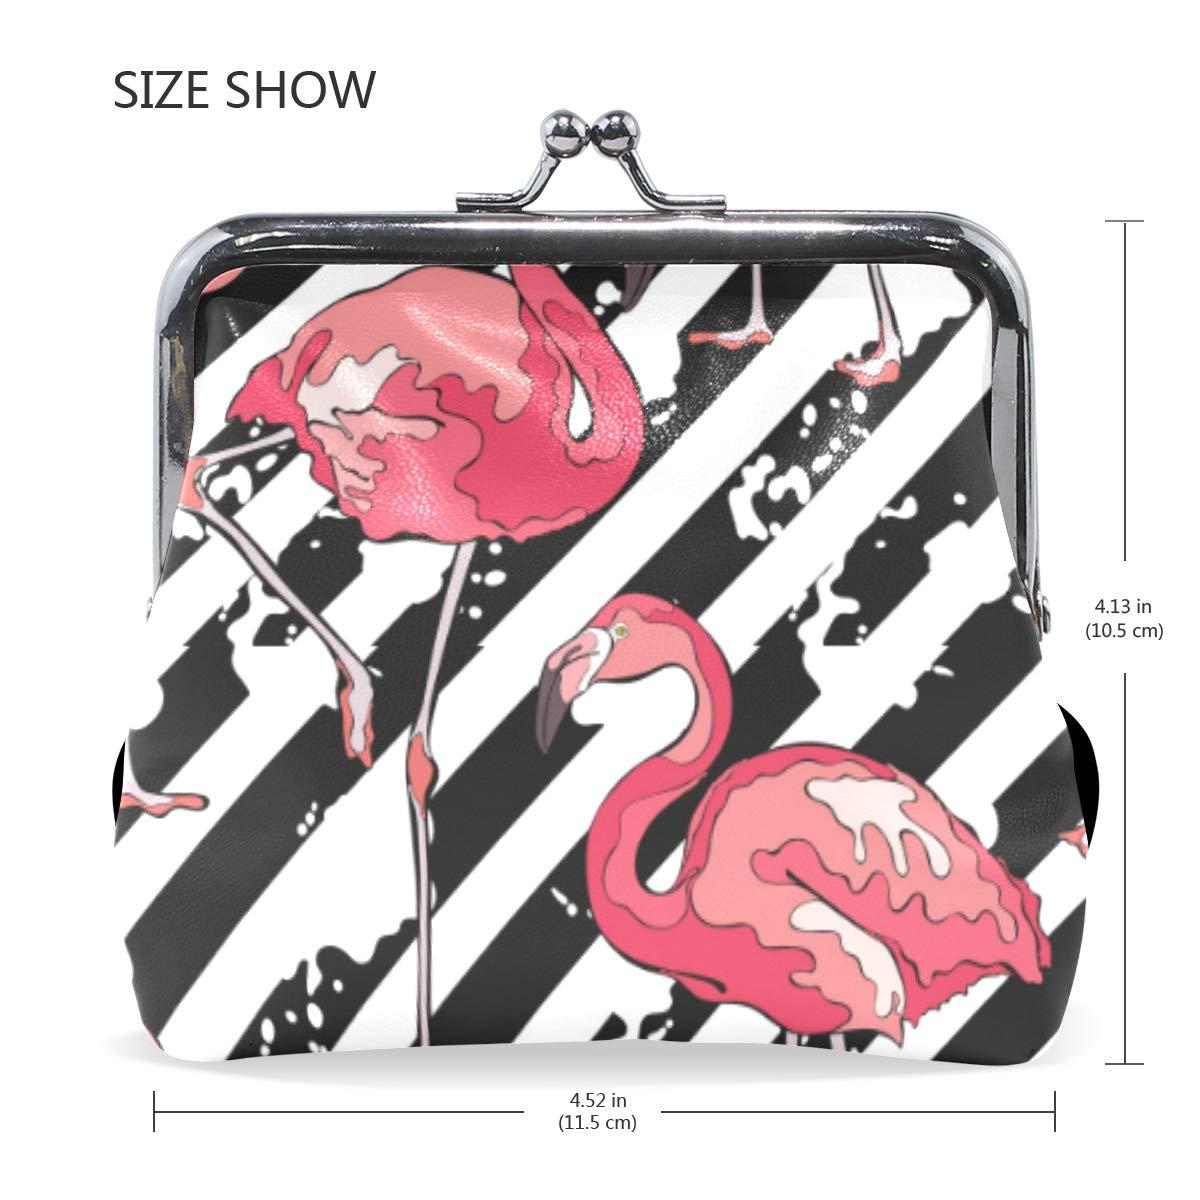 WIHVE Fashion Womens Coin Purse Colorful Flamingos Striped Vintage Pouch Mini Purse Wallets